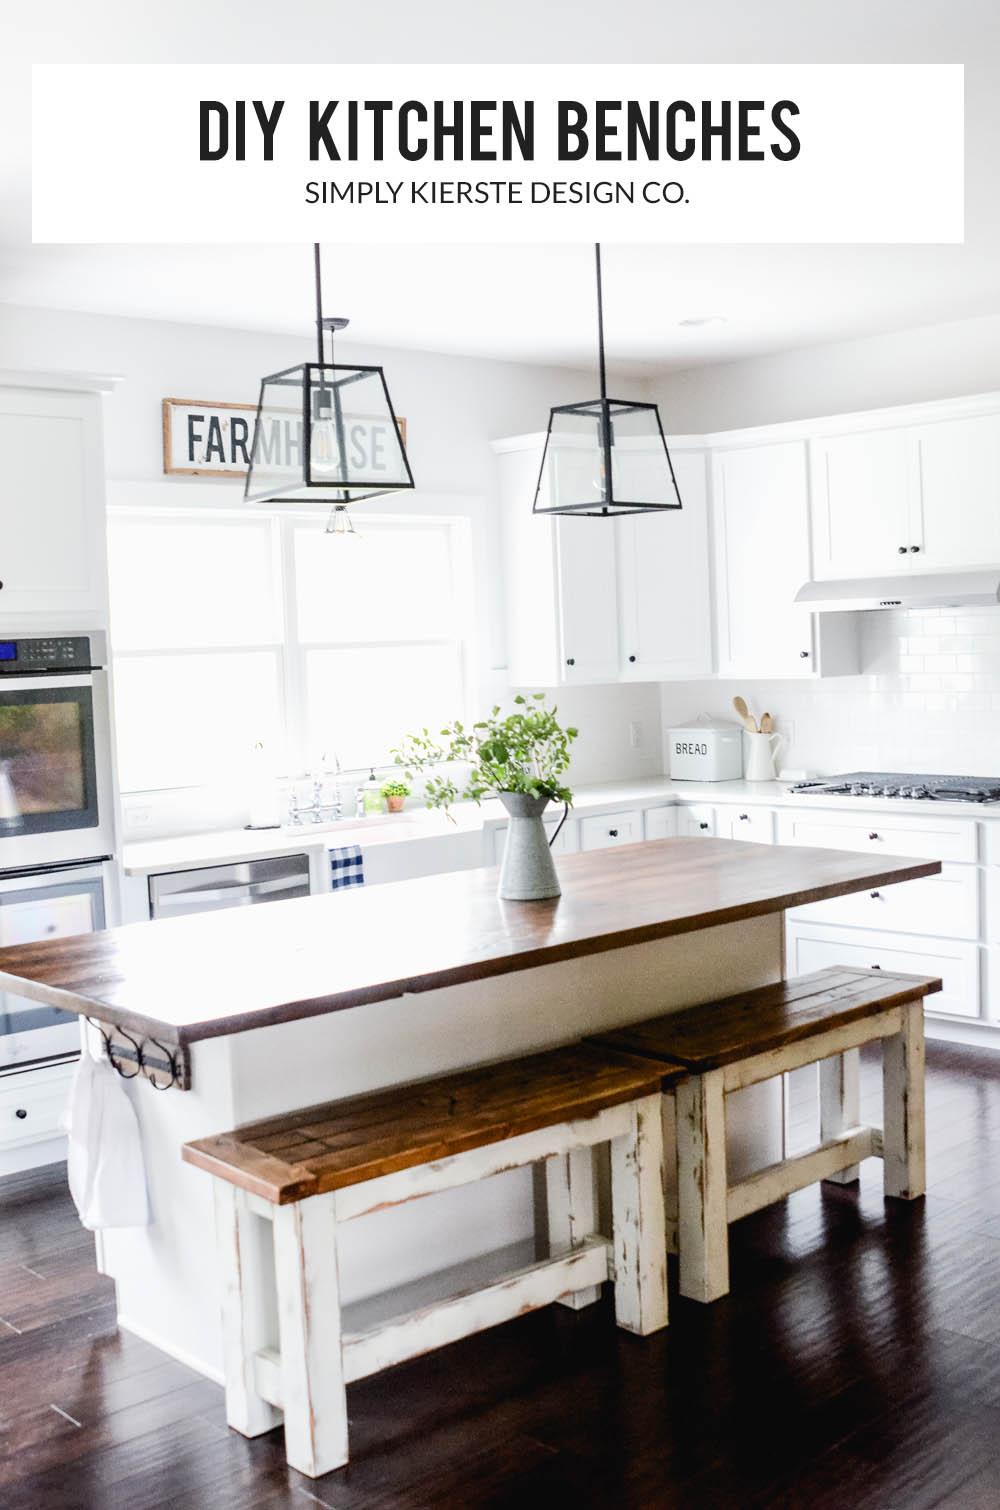 Sensational Diy Kitchen Benches Budget Kitchen Ideas Farmhouse Style Beatyapartments Chair Design Images Beatyapartmentscom